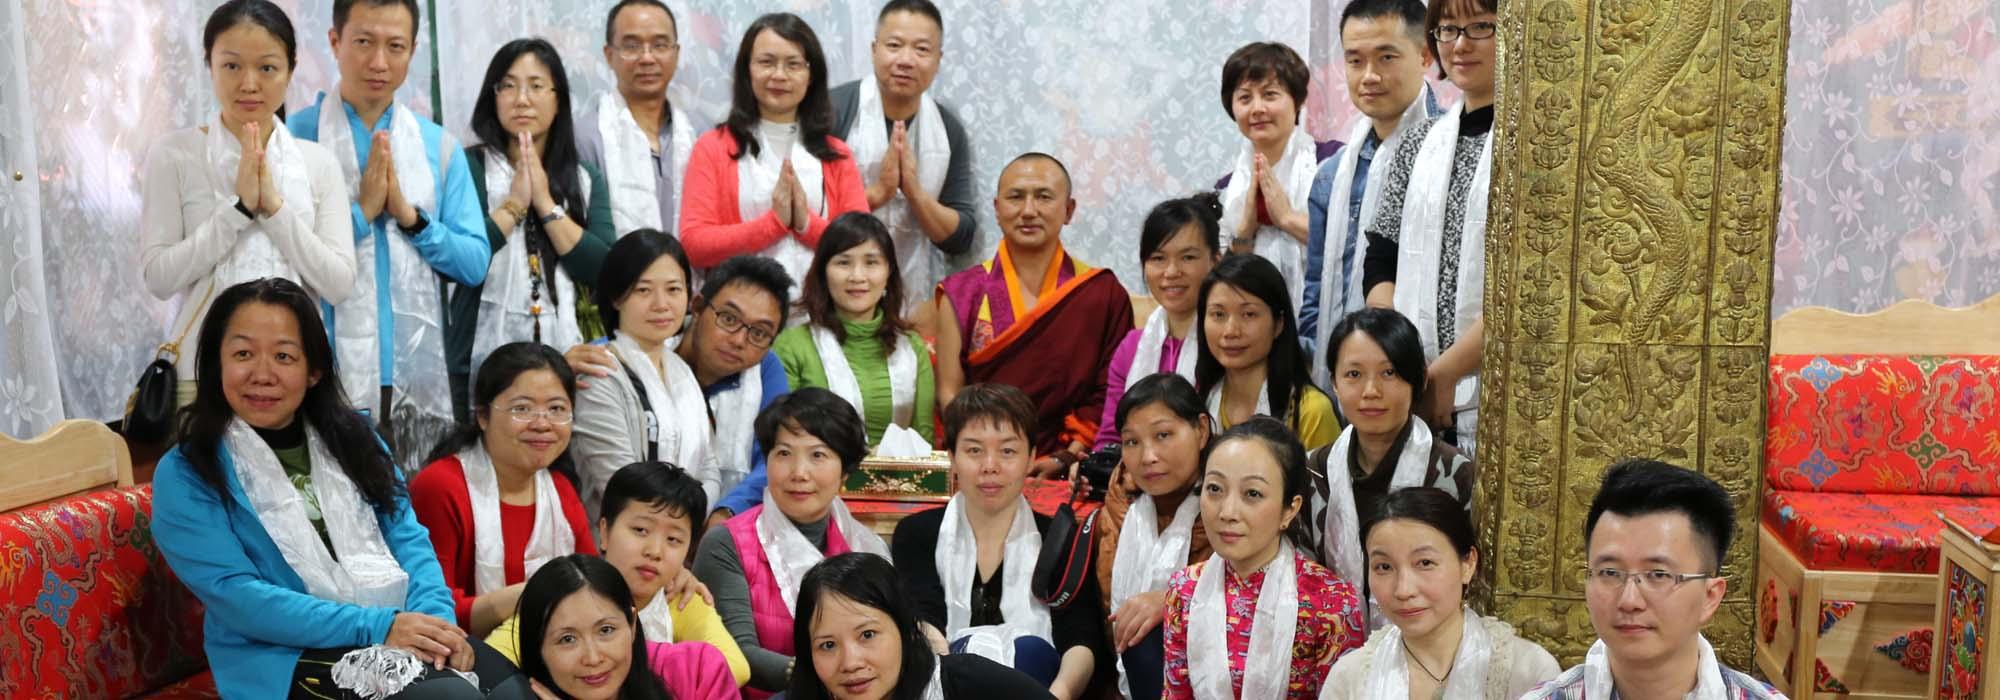 Bhutan Majestic Travel Special